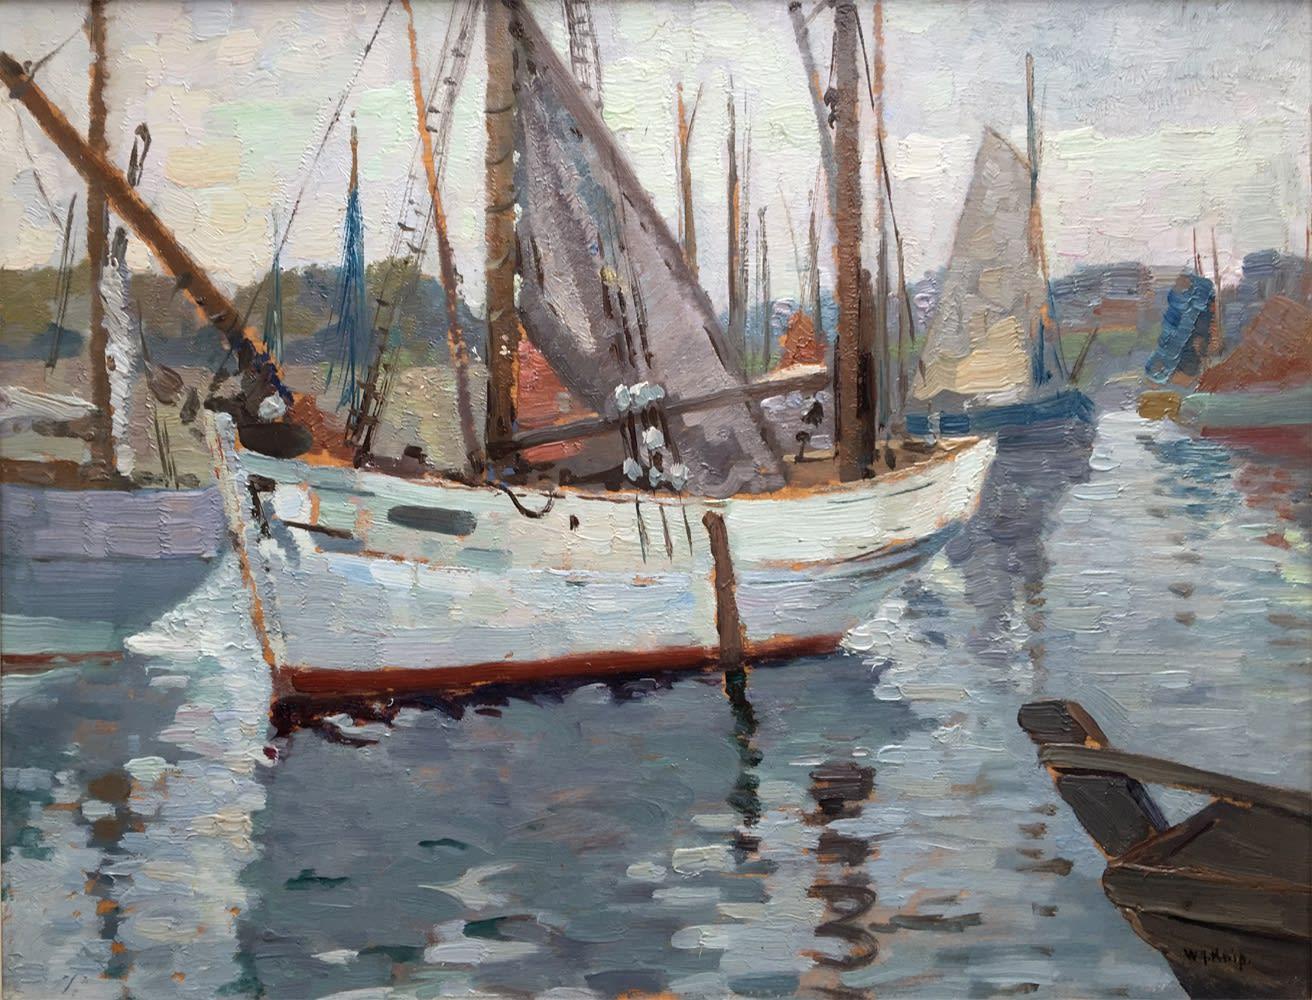 Willem Knip